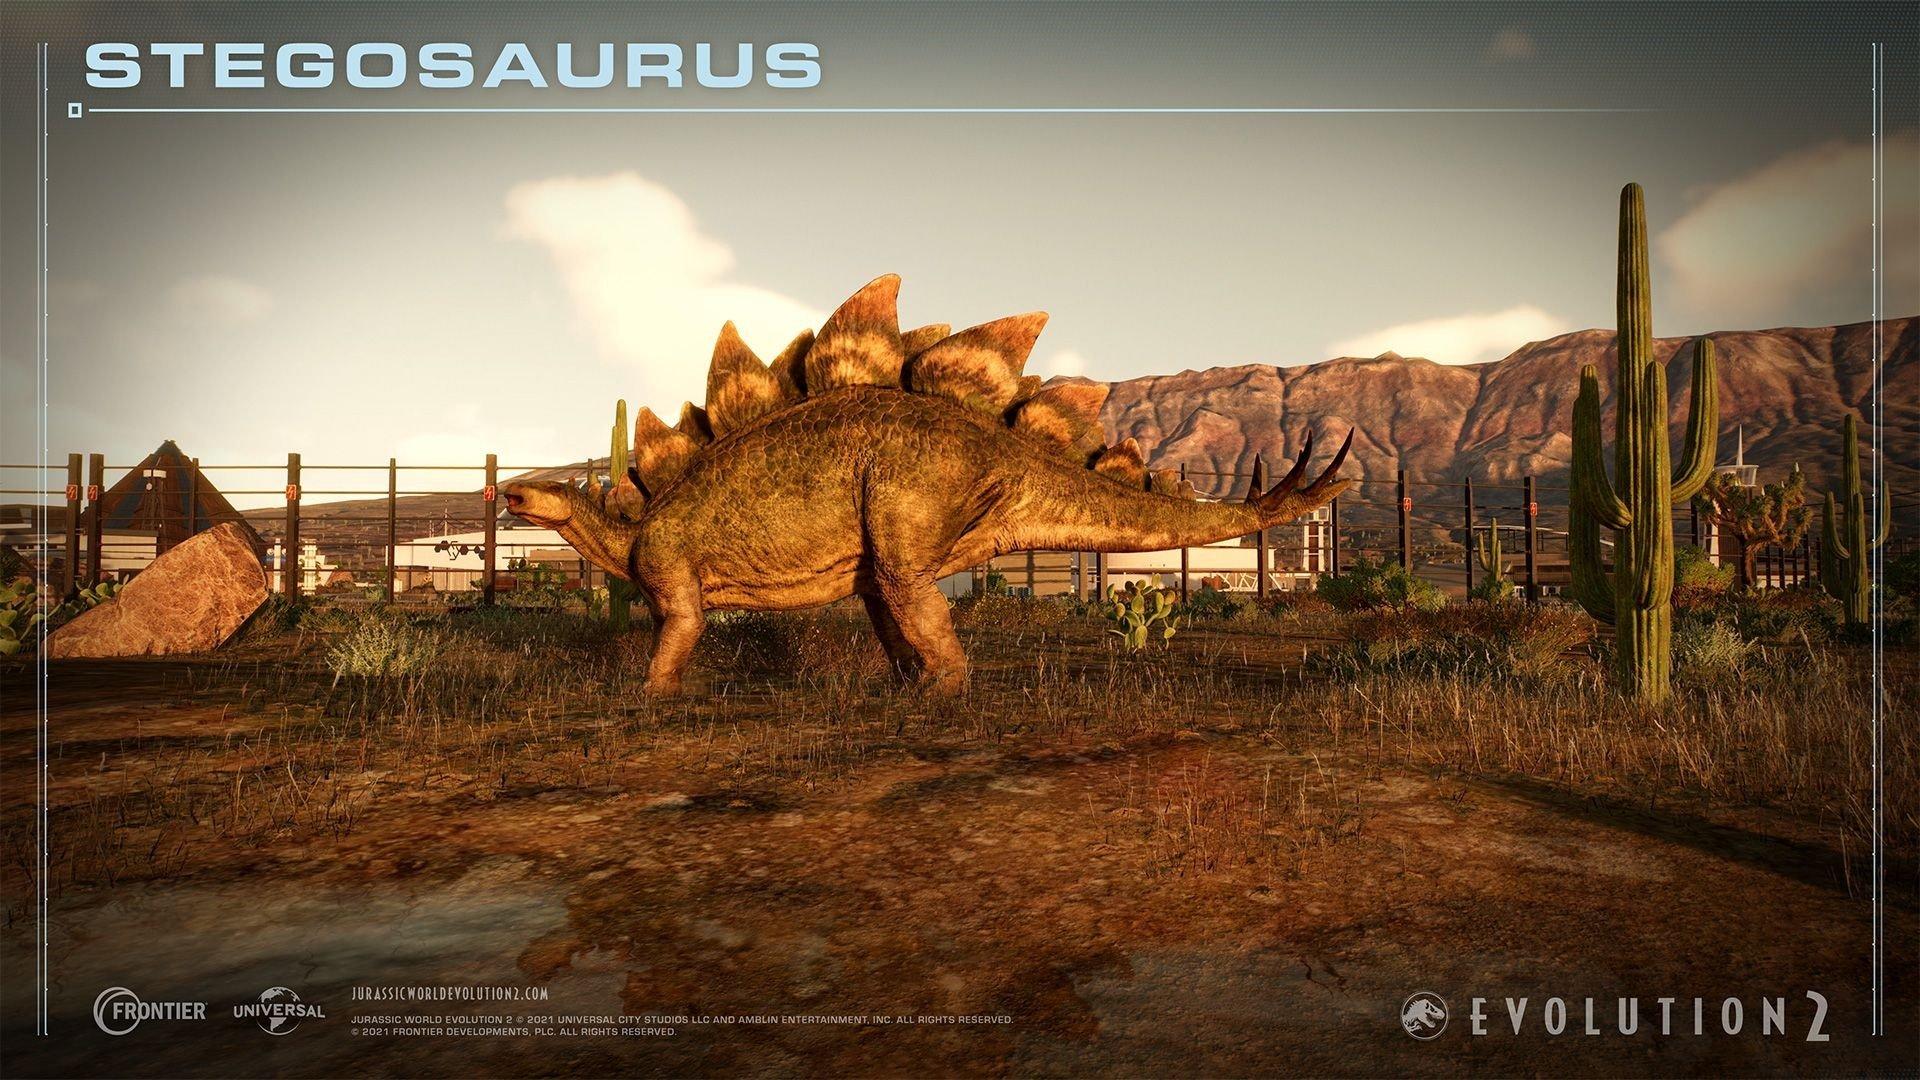 Jurassic-World-Evolution-2-Stegosaurus